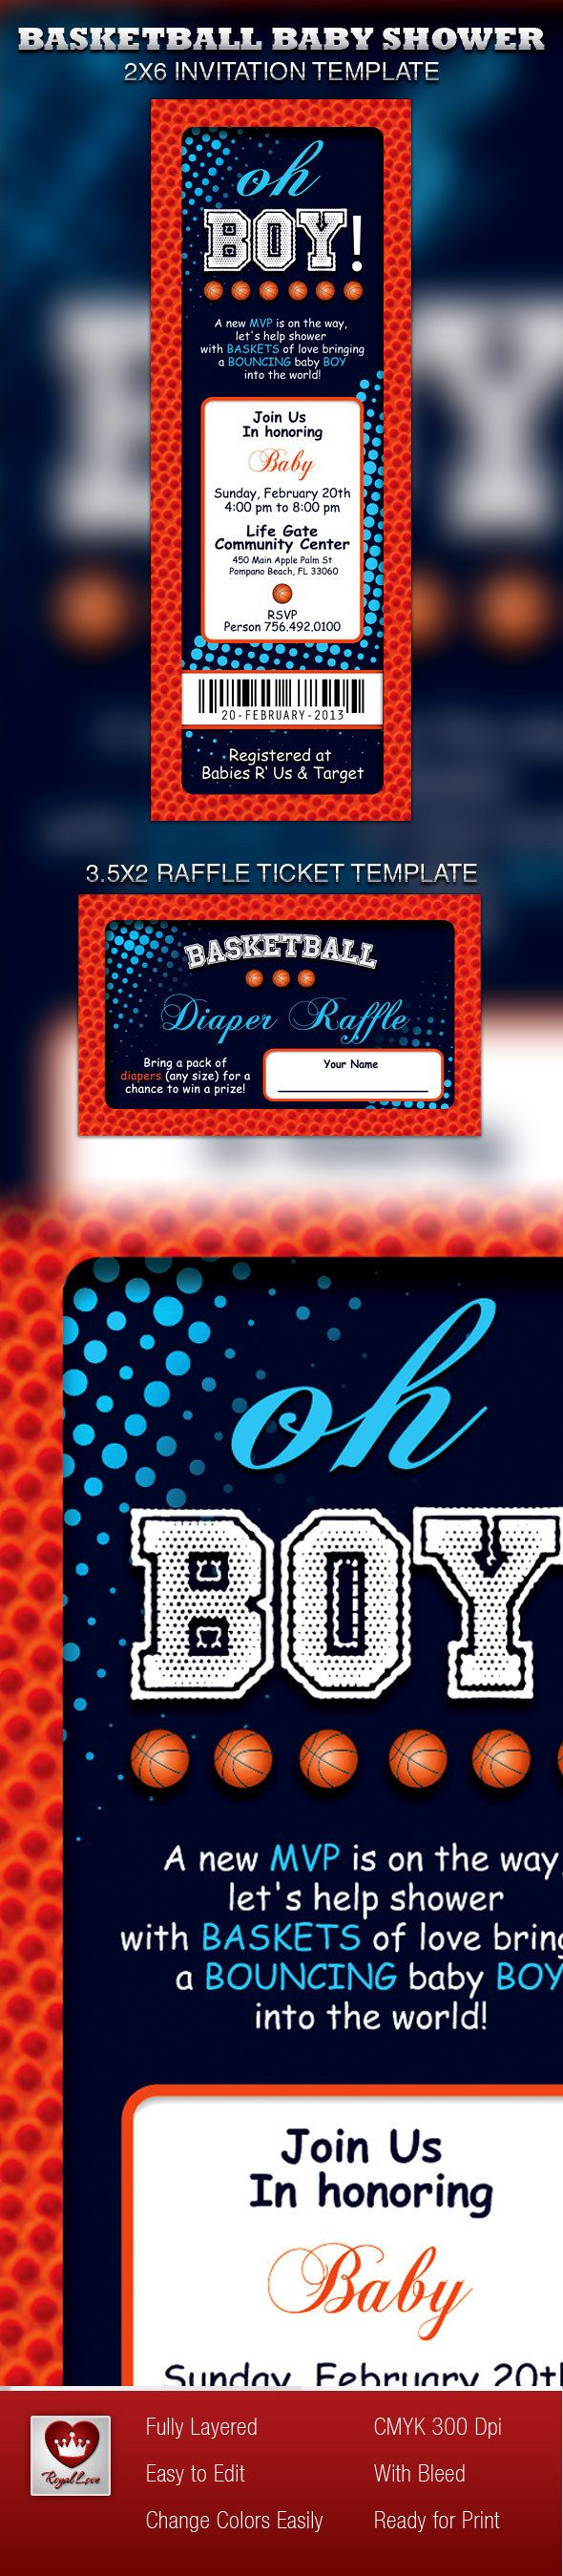 Basketball Baby Shower Invitation by Royal Love, via Behance